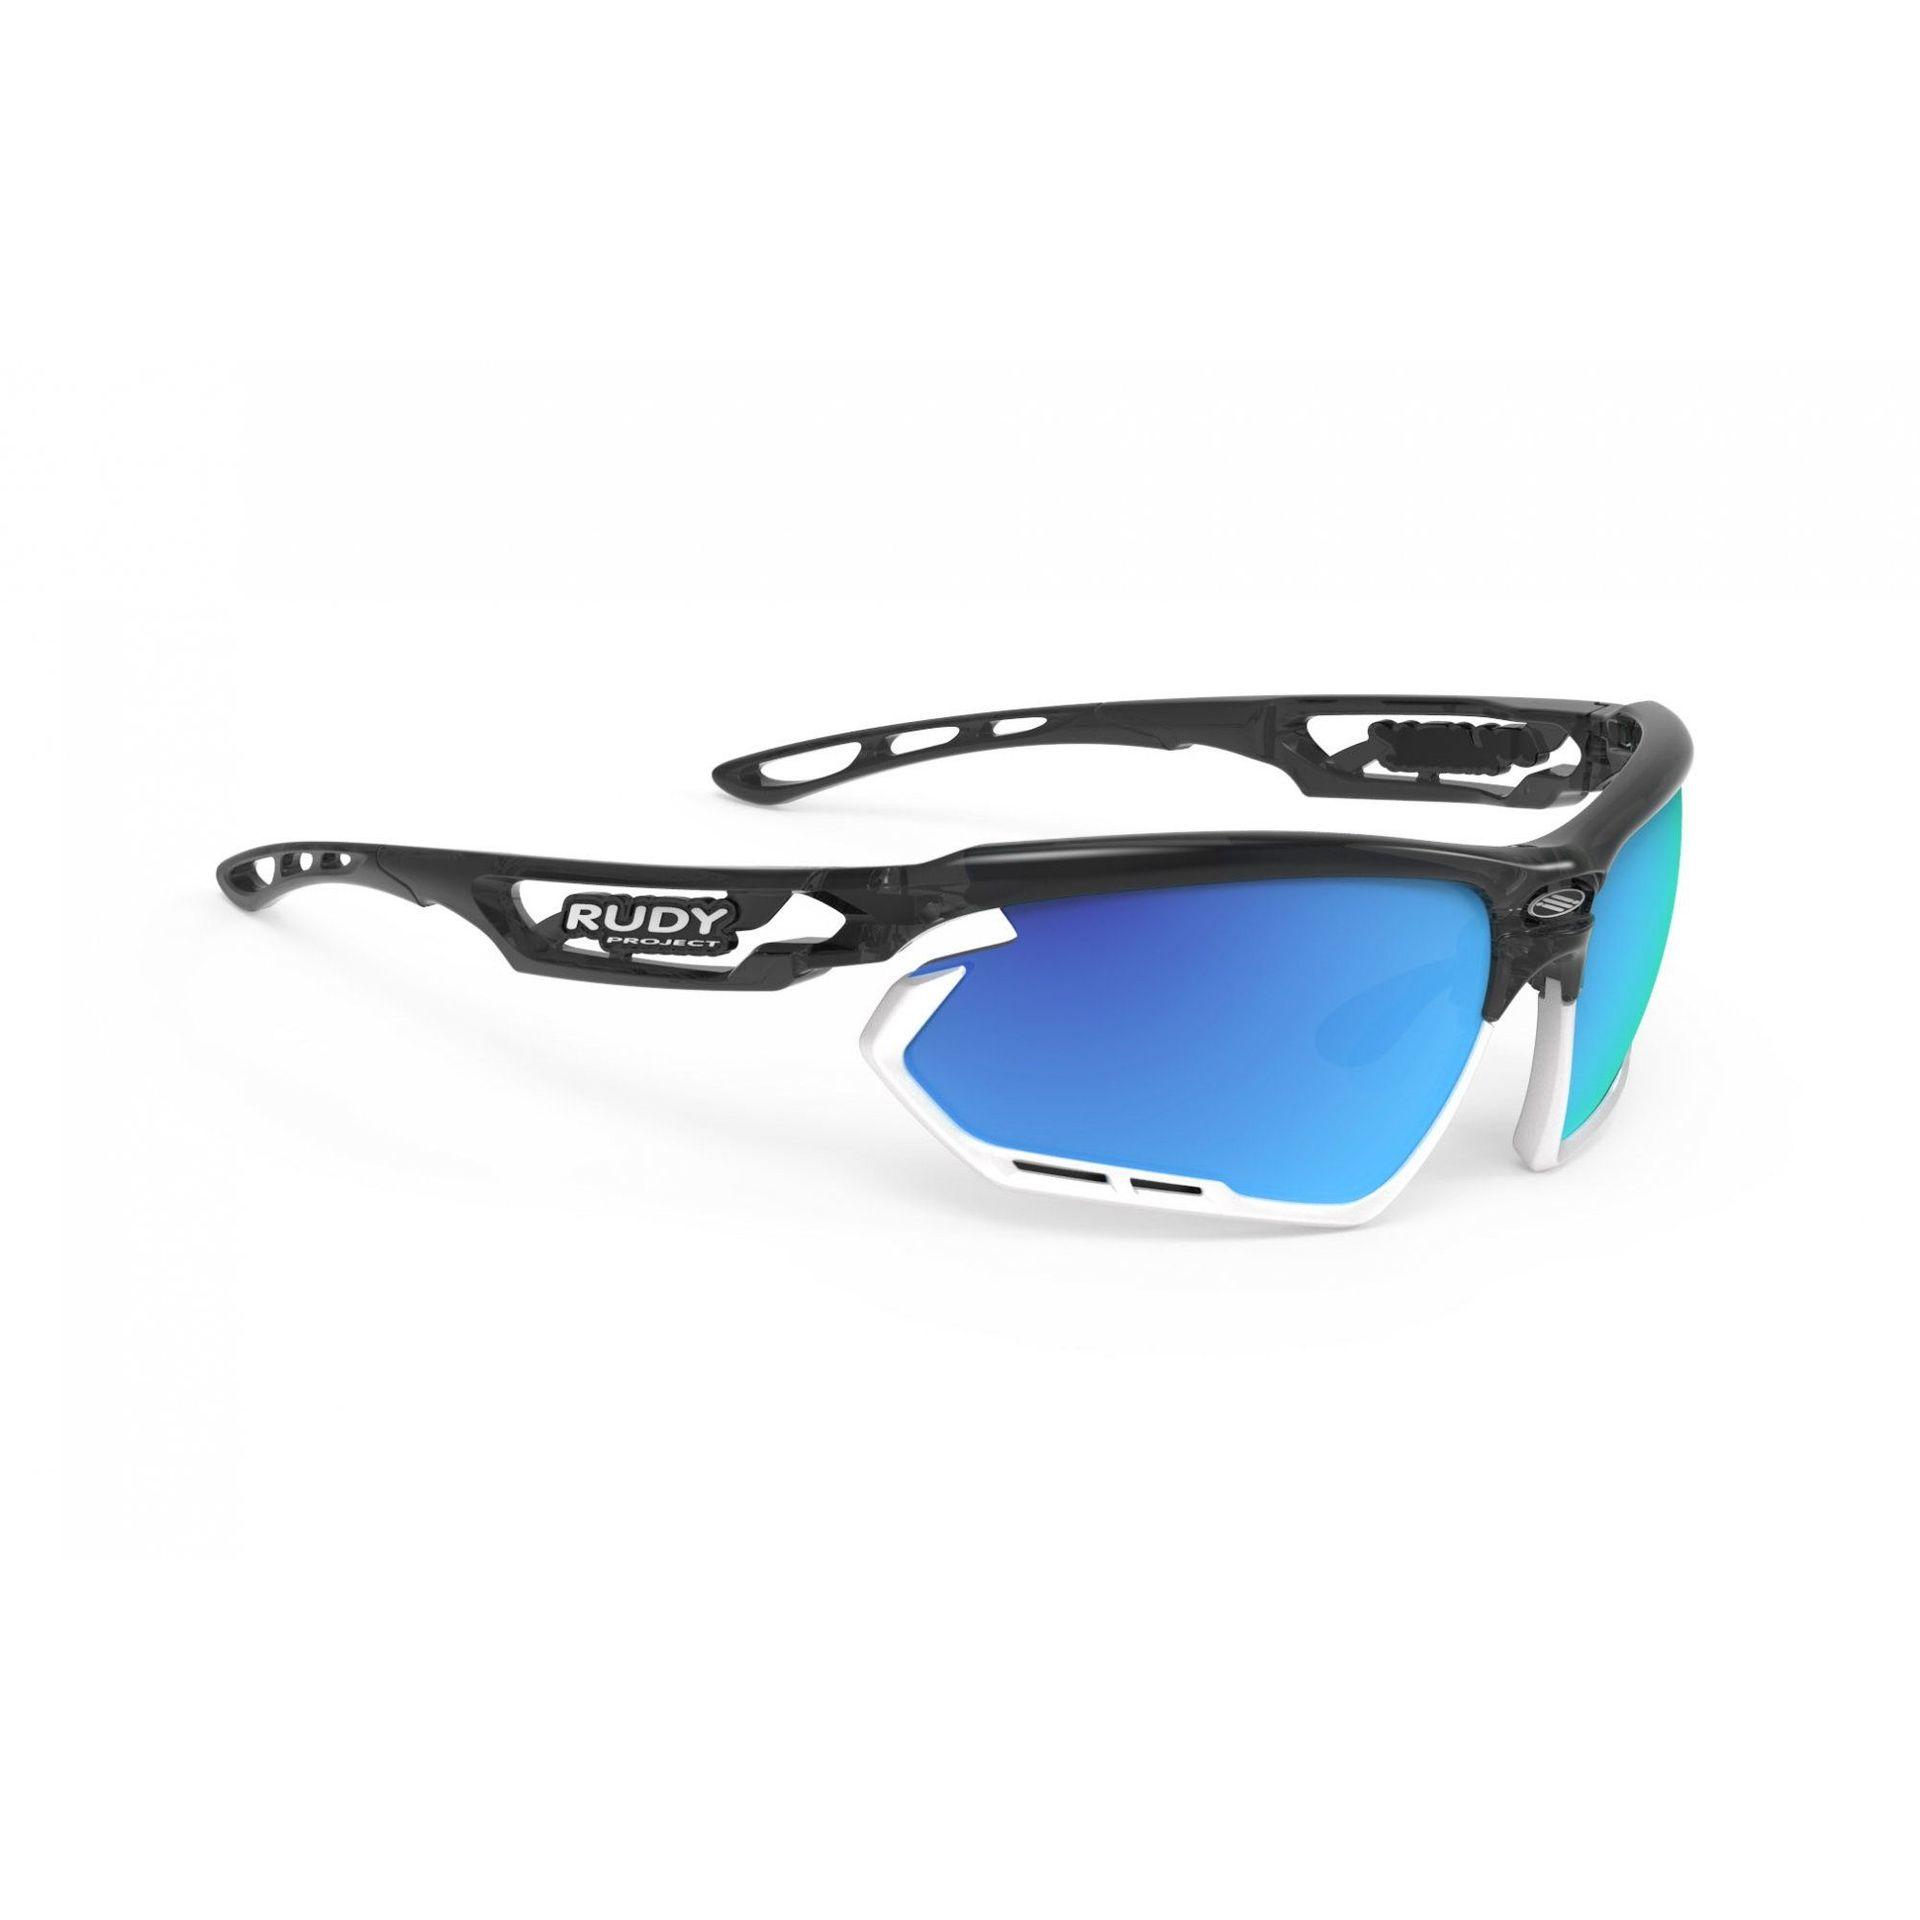 OKULARY RUDY PROJECT FOTONYK GRAPHITE|WHITE + ML BLUE SP453995 1